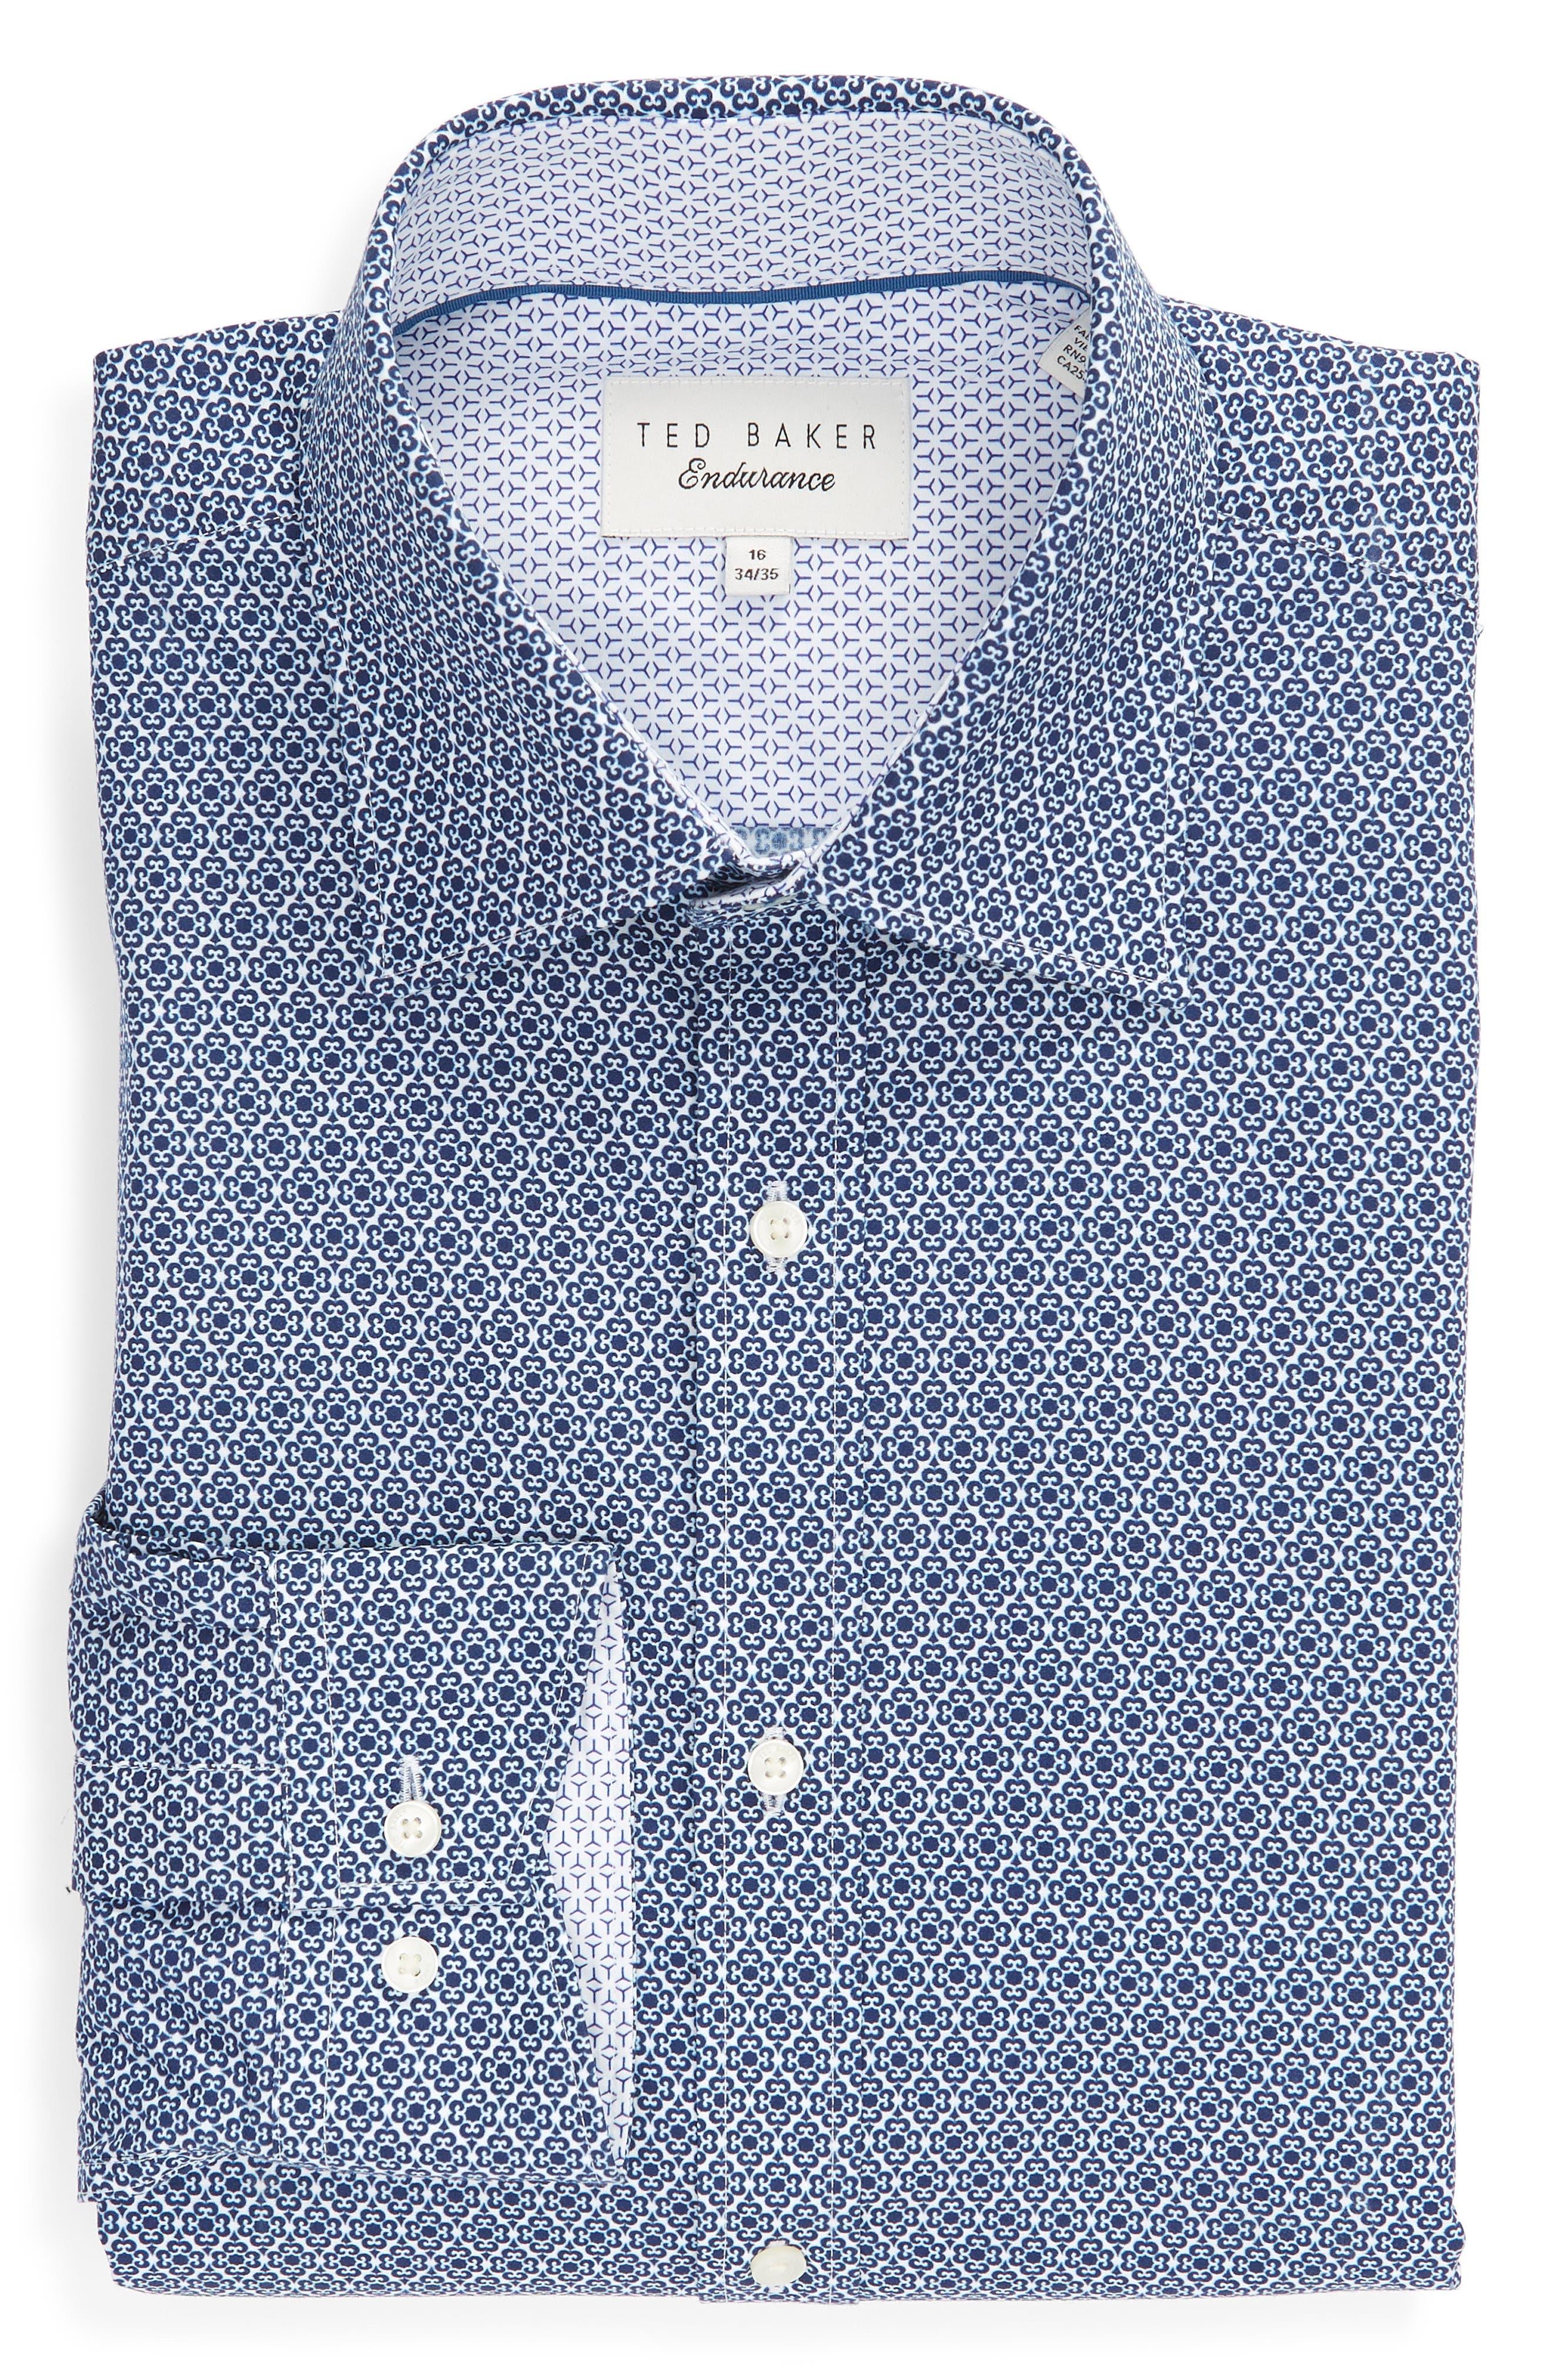 Slestmi Slim Fit Print Dress Shirt,                             Alternate thumbnail 5, color,                             BLUE